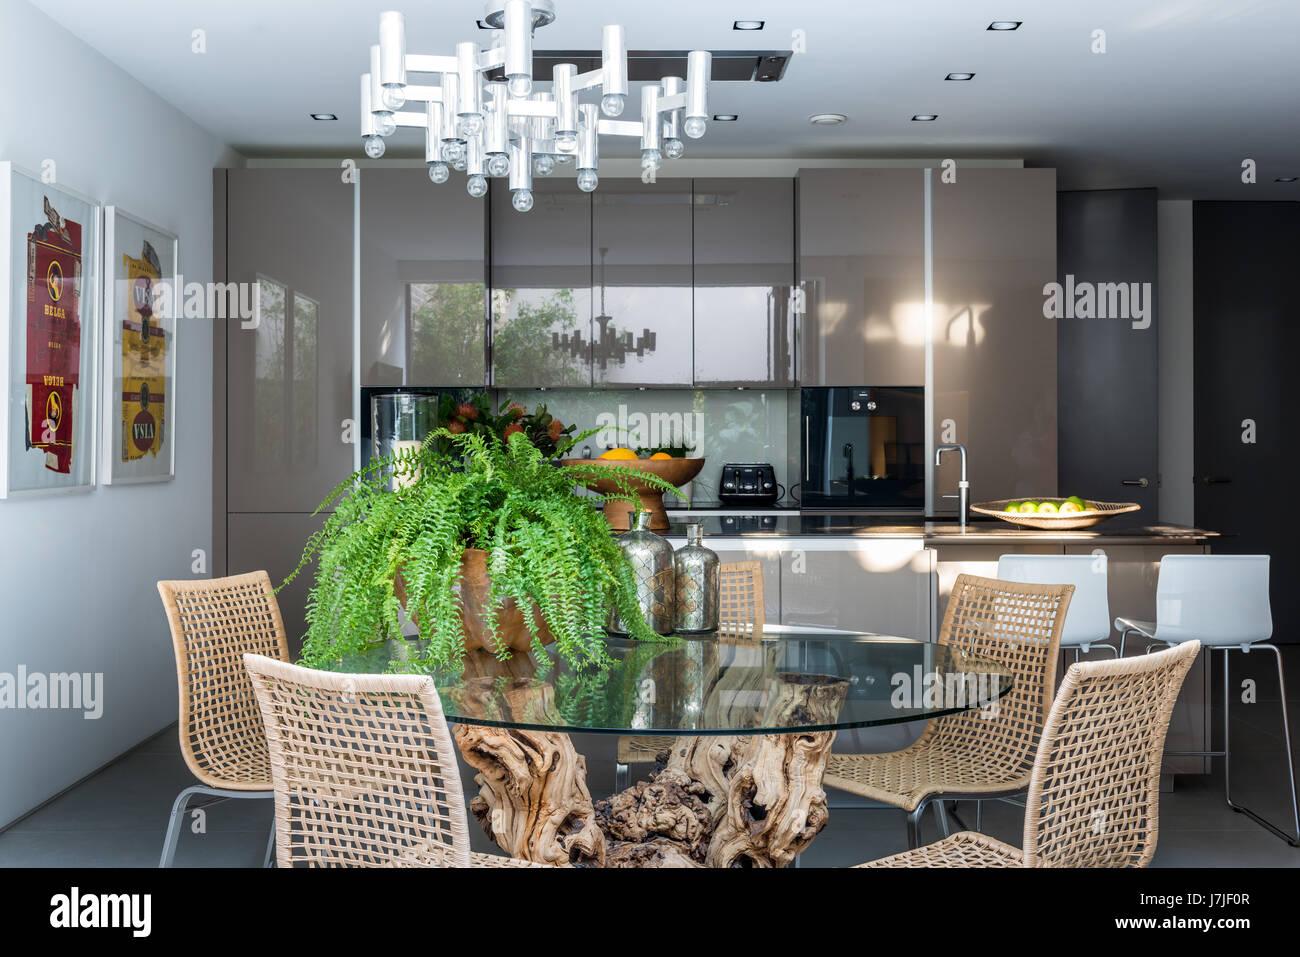 Sedie Per Sala Da Pranzo Ikea : Radice tavolo da pranzo da hugh mclaughlin in cucina con sala da